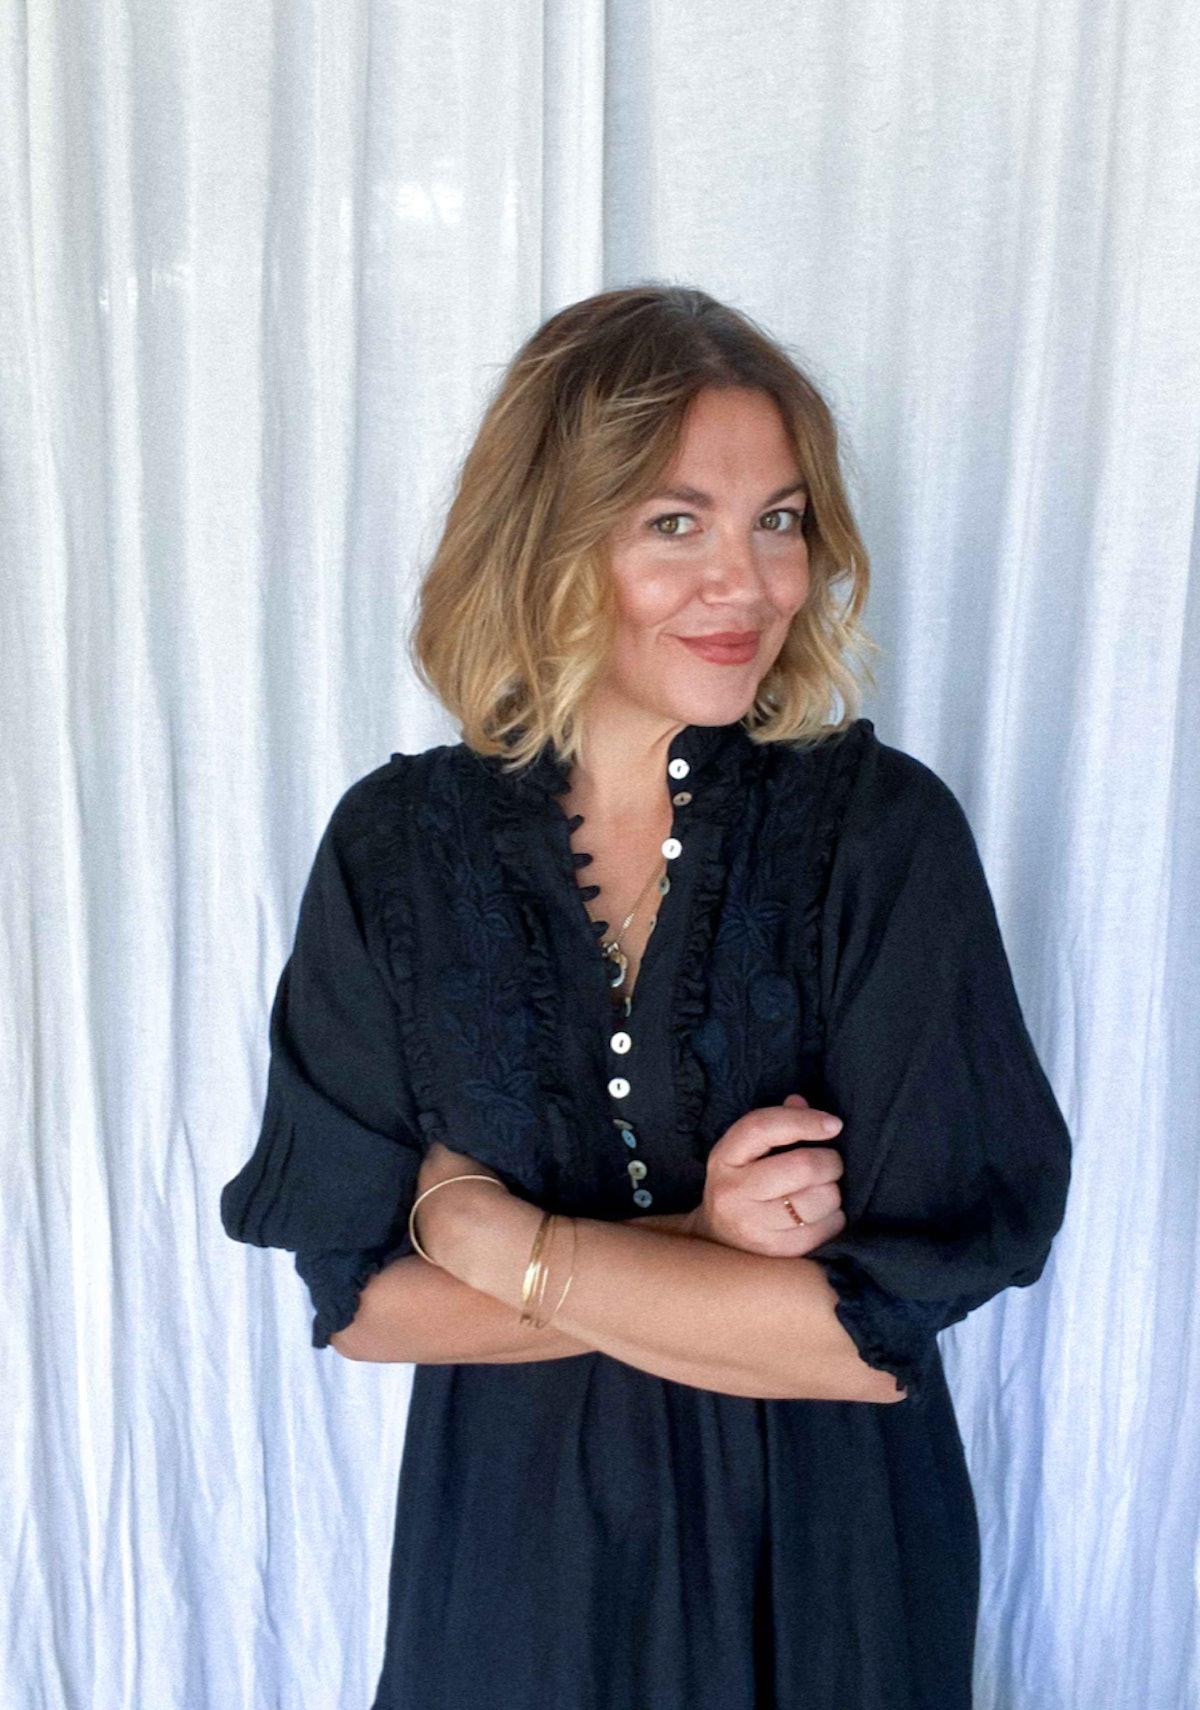 Laura Liles Kinga Csilla female founders mental health